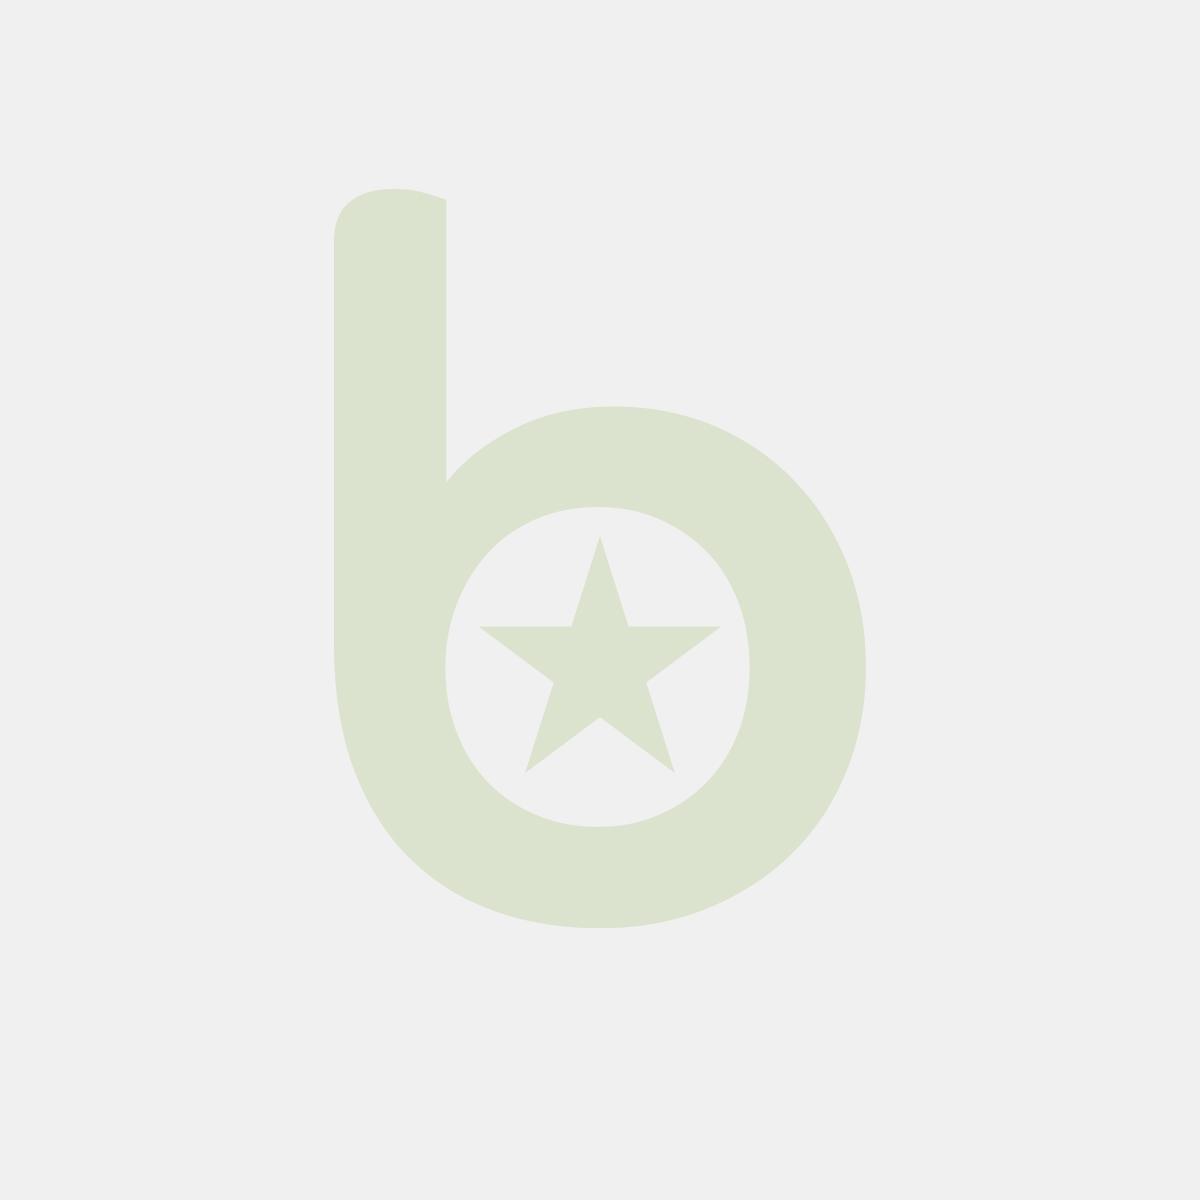 FINGERFOOD - patyczki 12 cm HEART żółte op. 100 sztuk